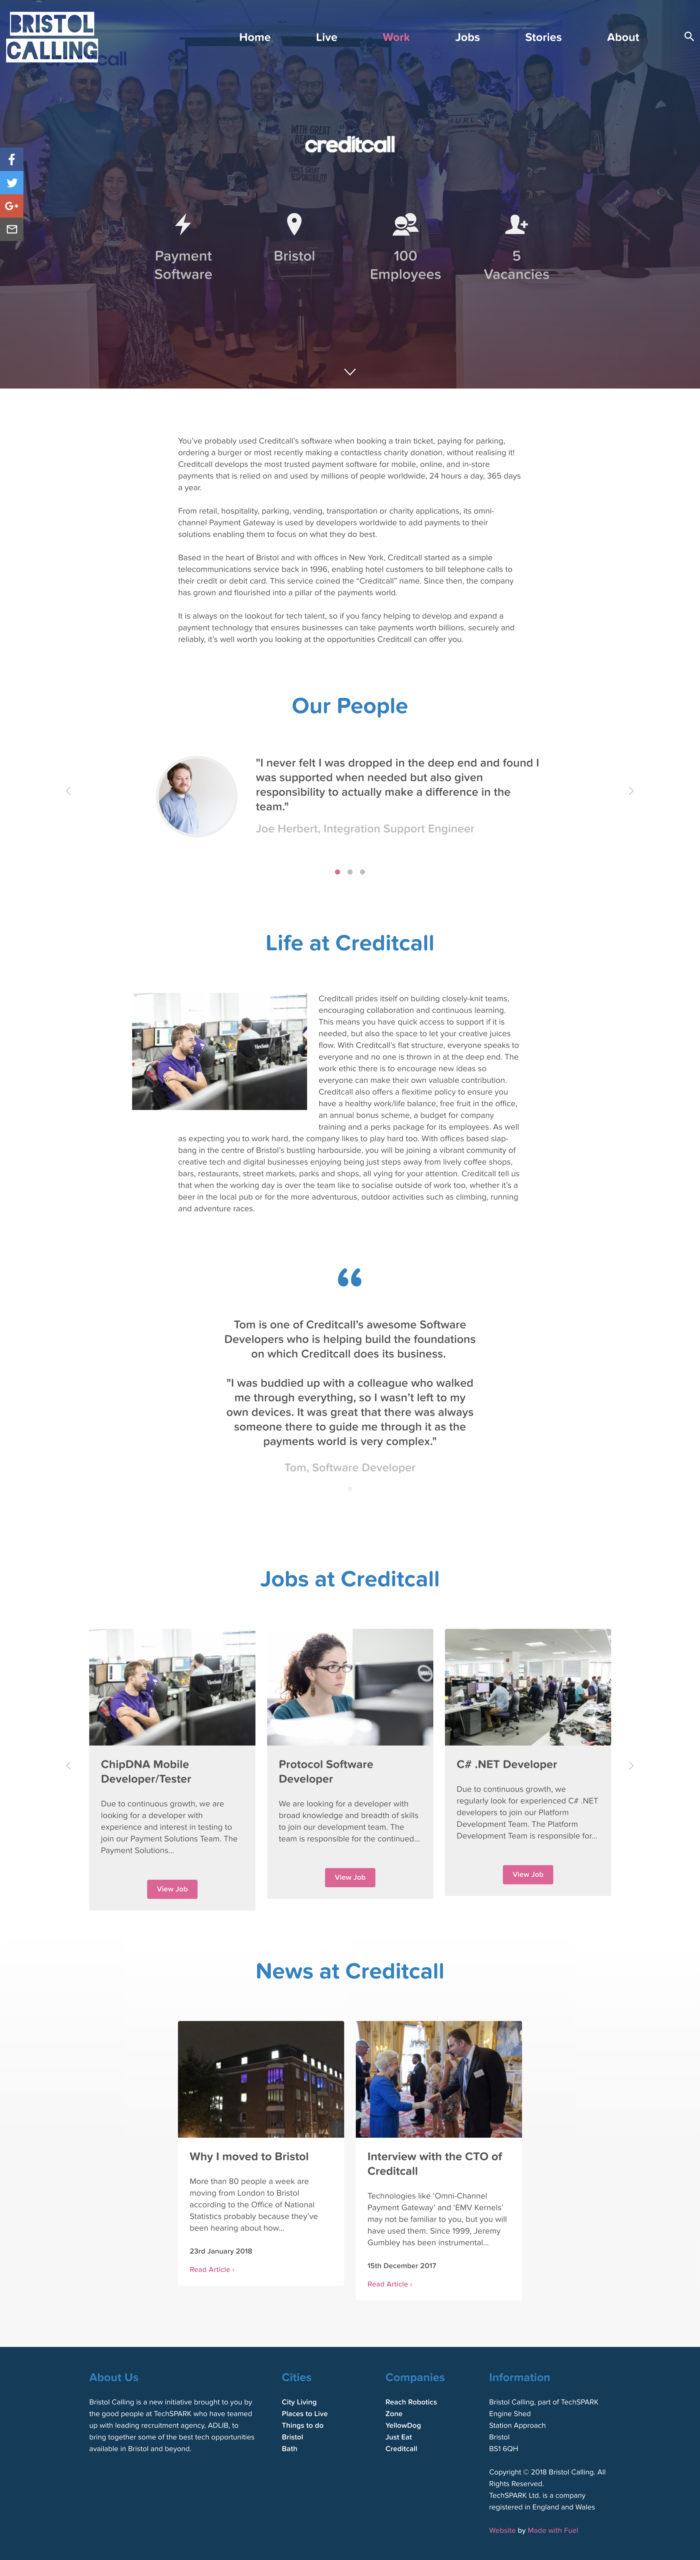 Bristol Calling - Company Page